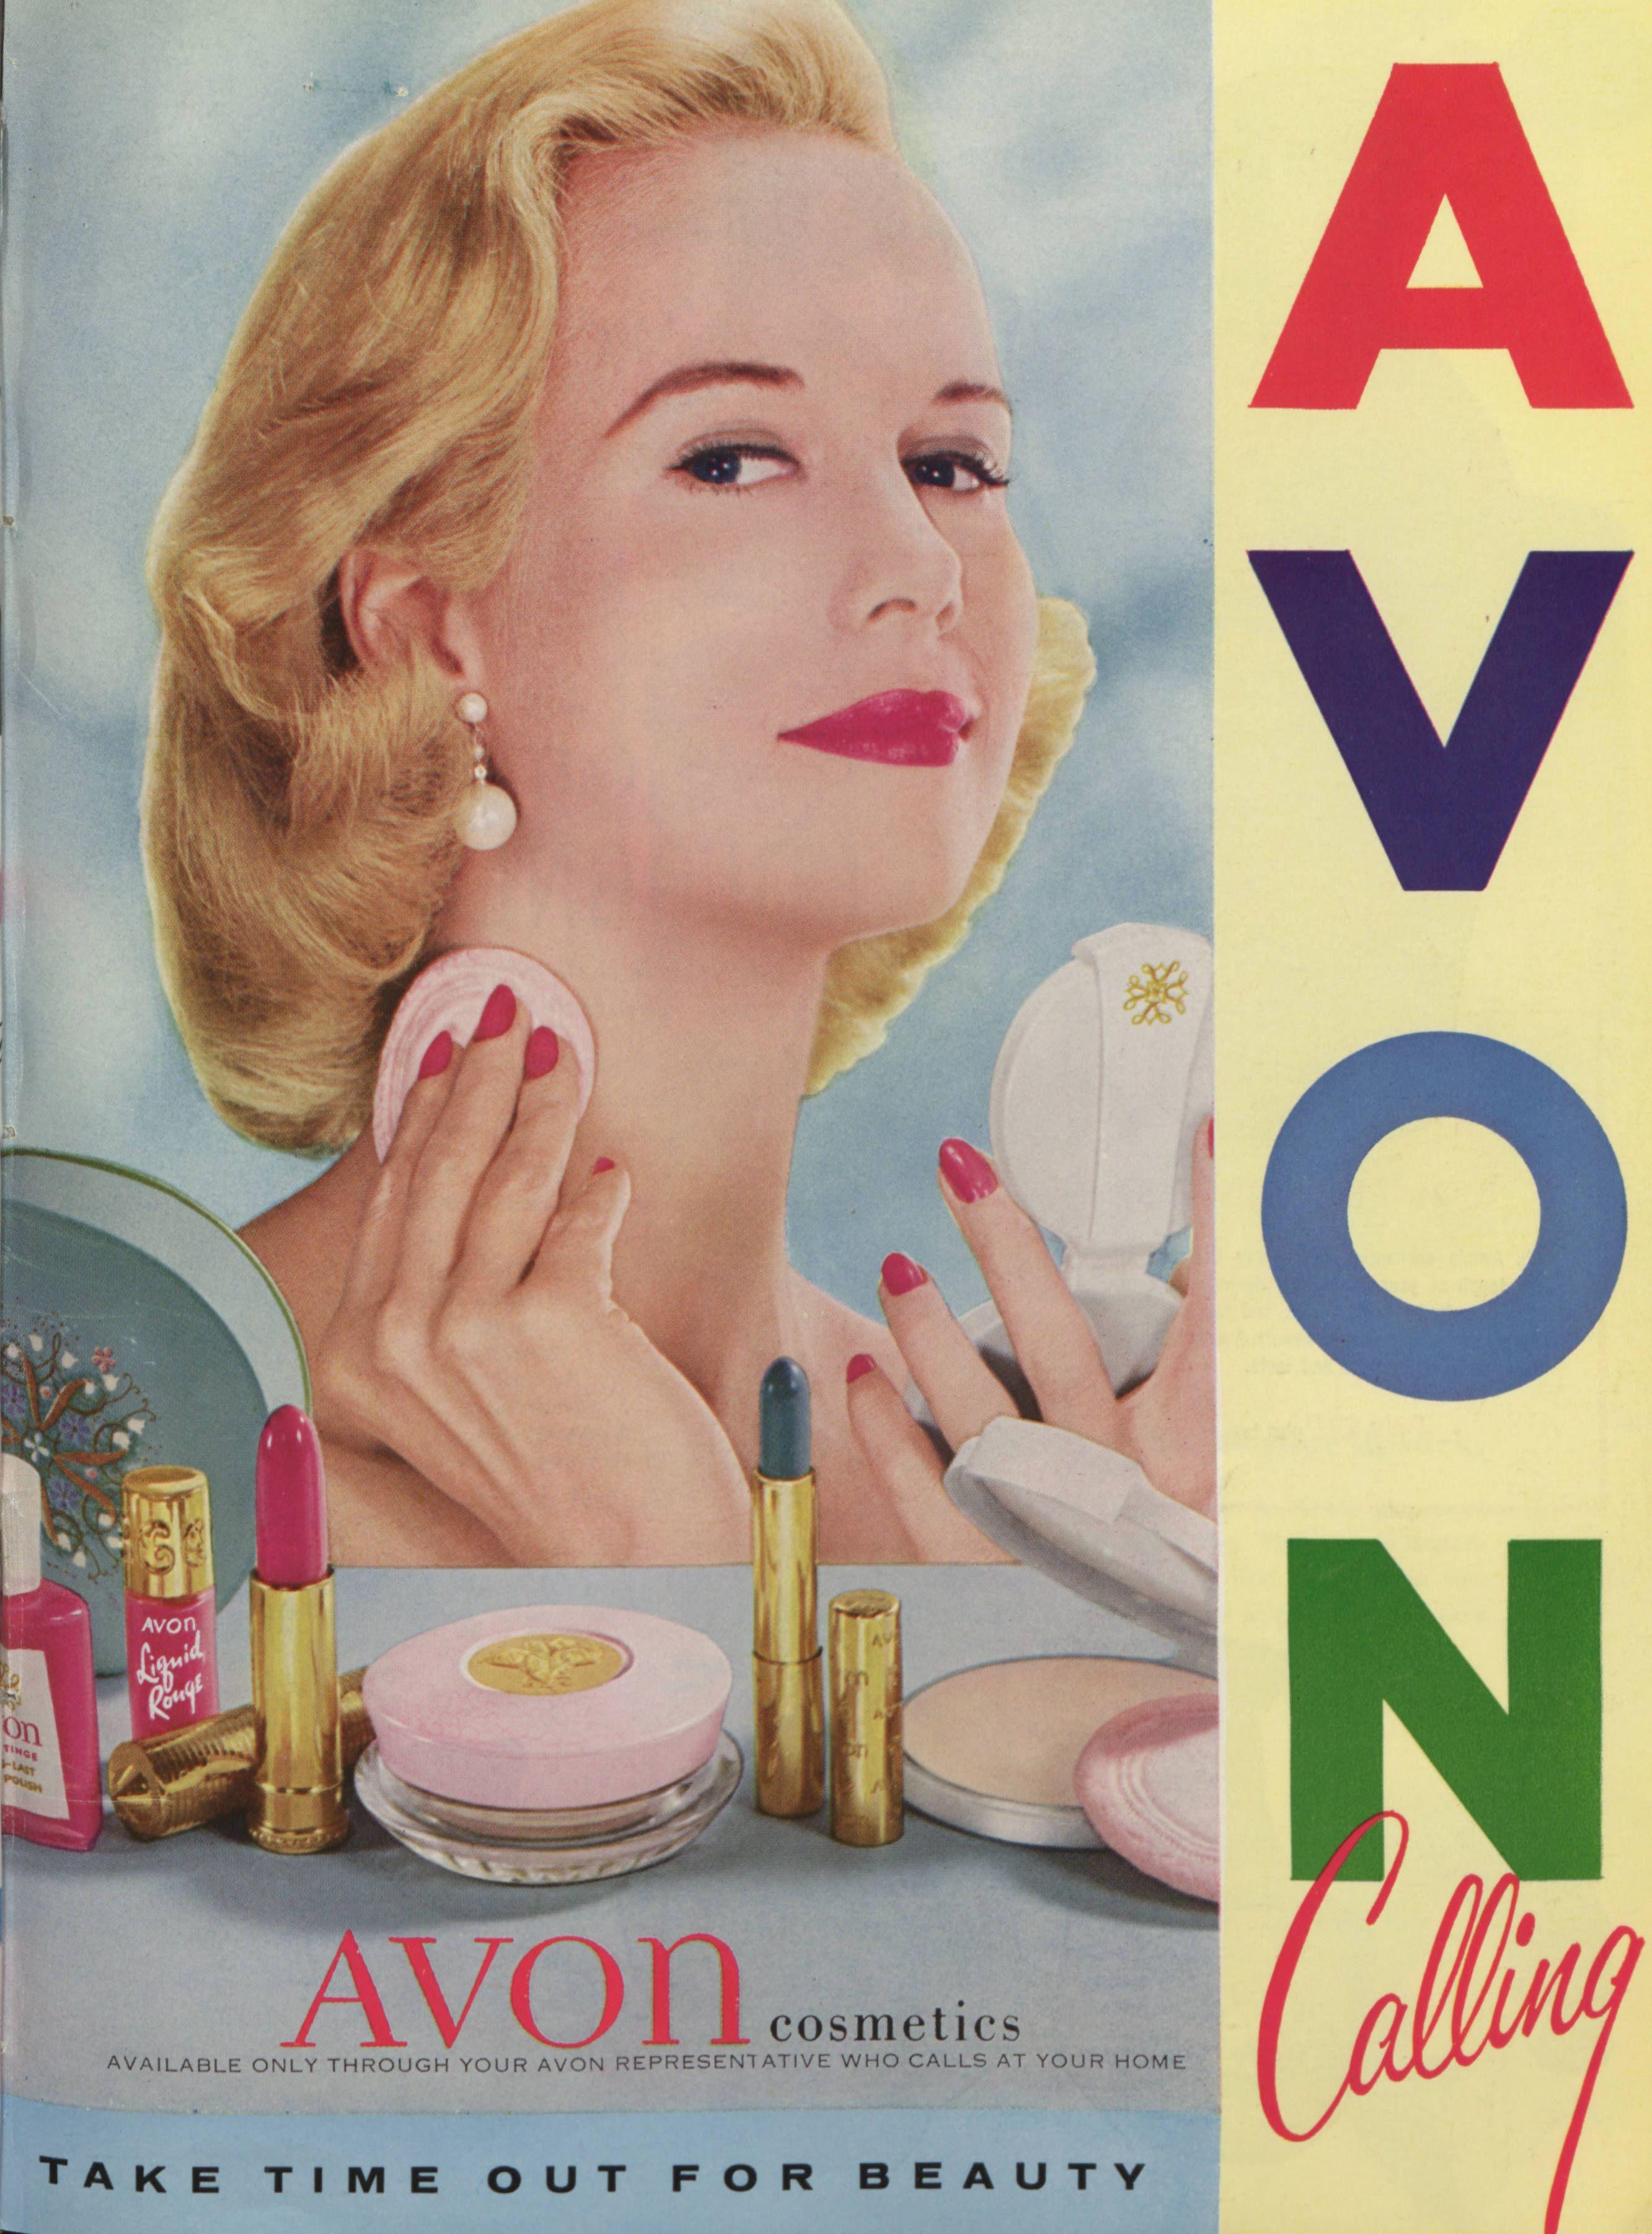 300 Best Avon Product Images In 2020 Avon Avon Cosmetics Avon Beauty